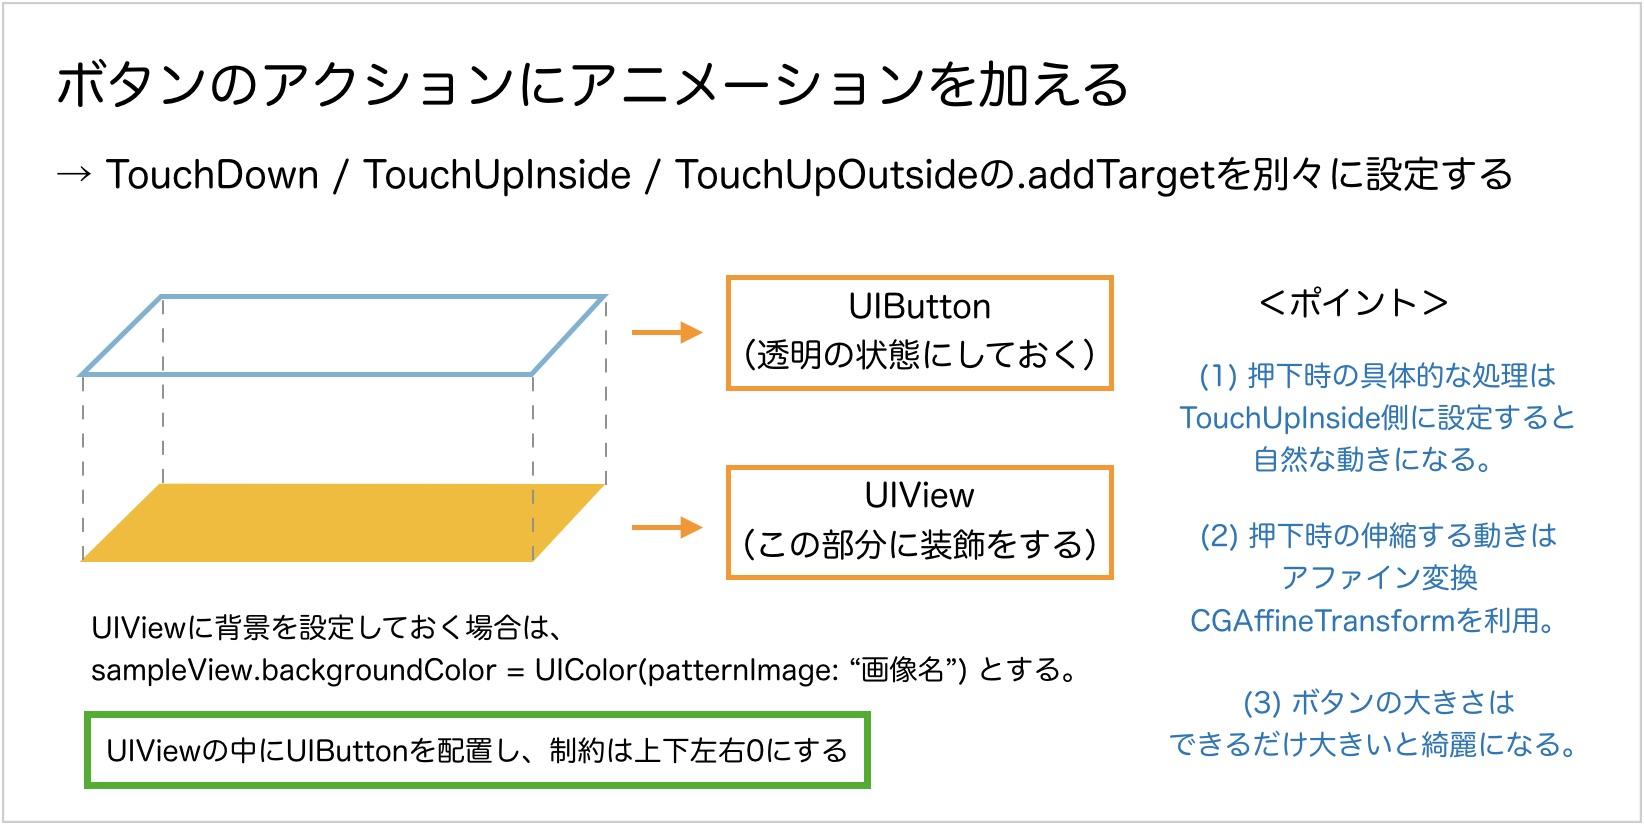 uibutton_image.jpg